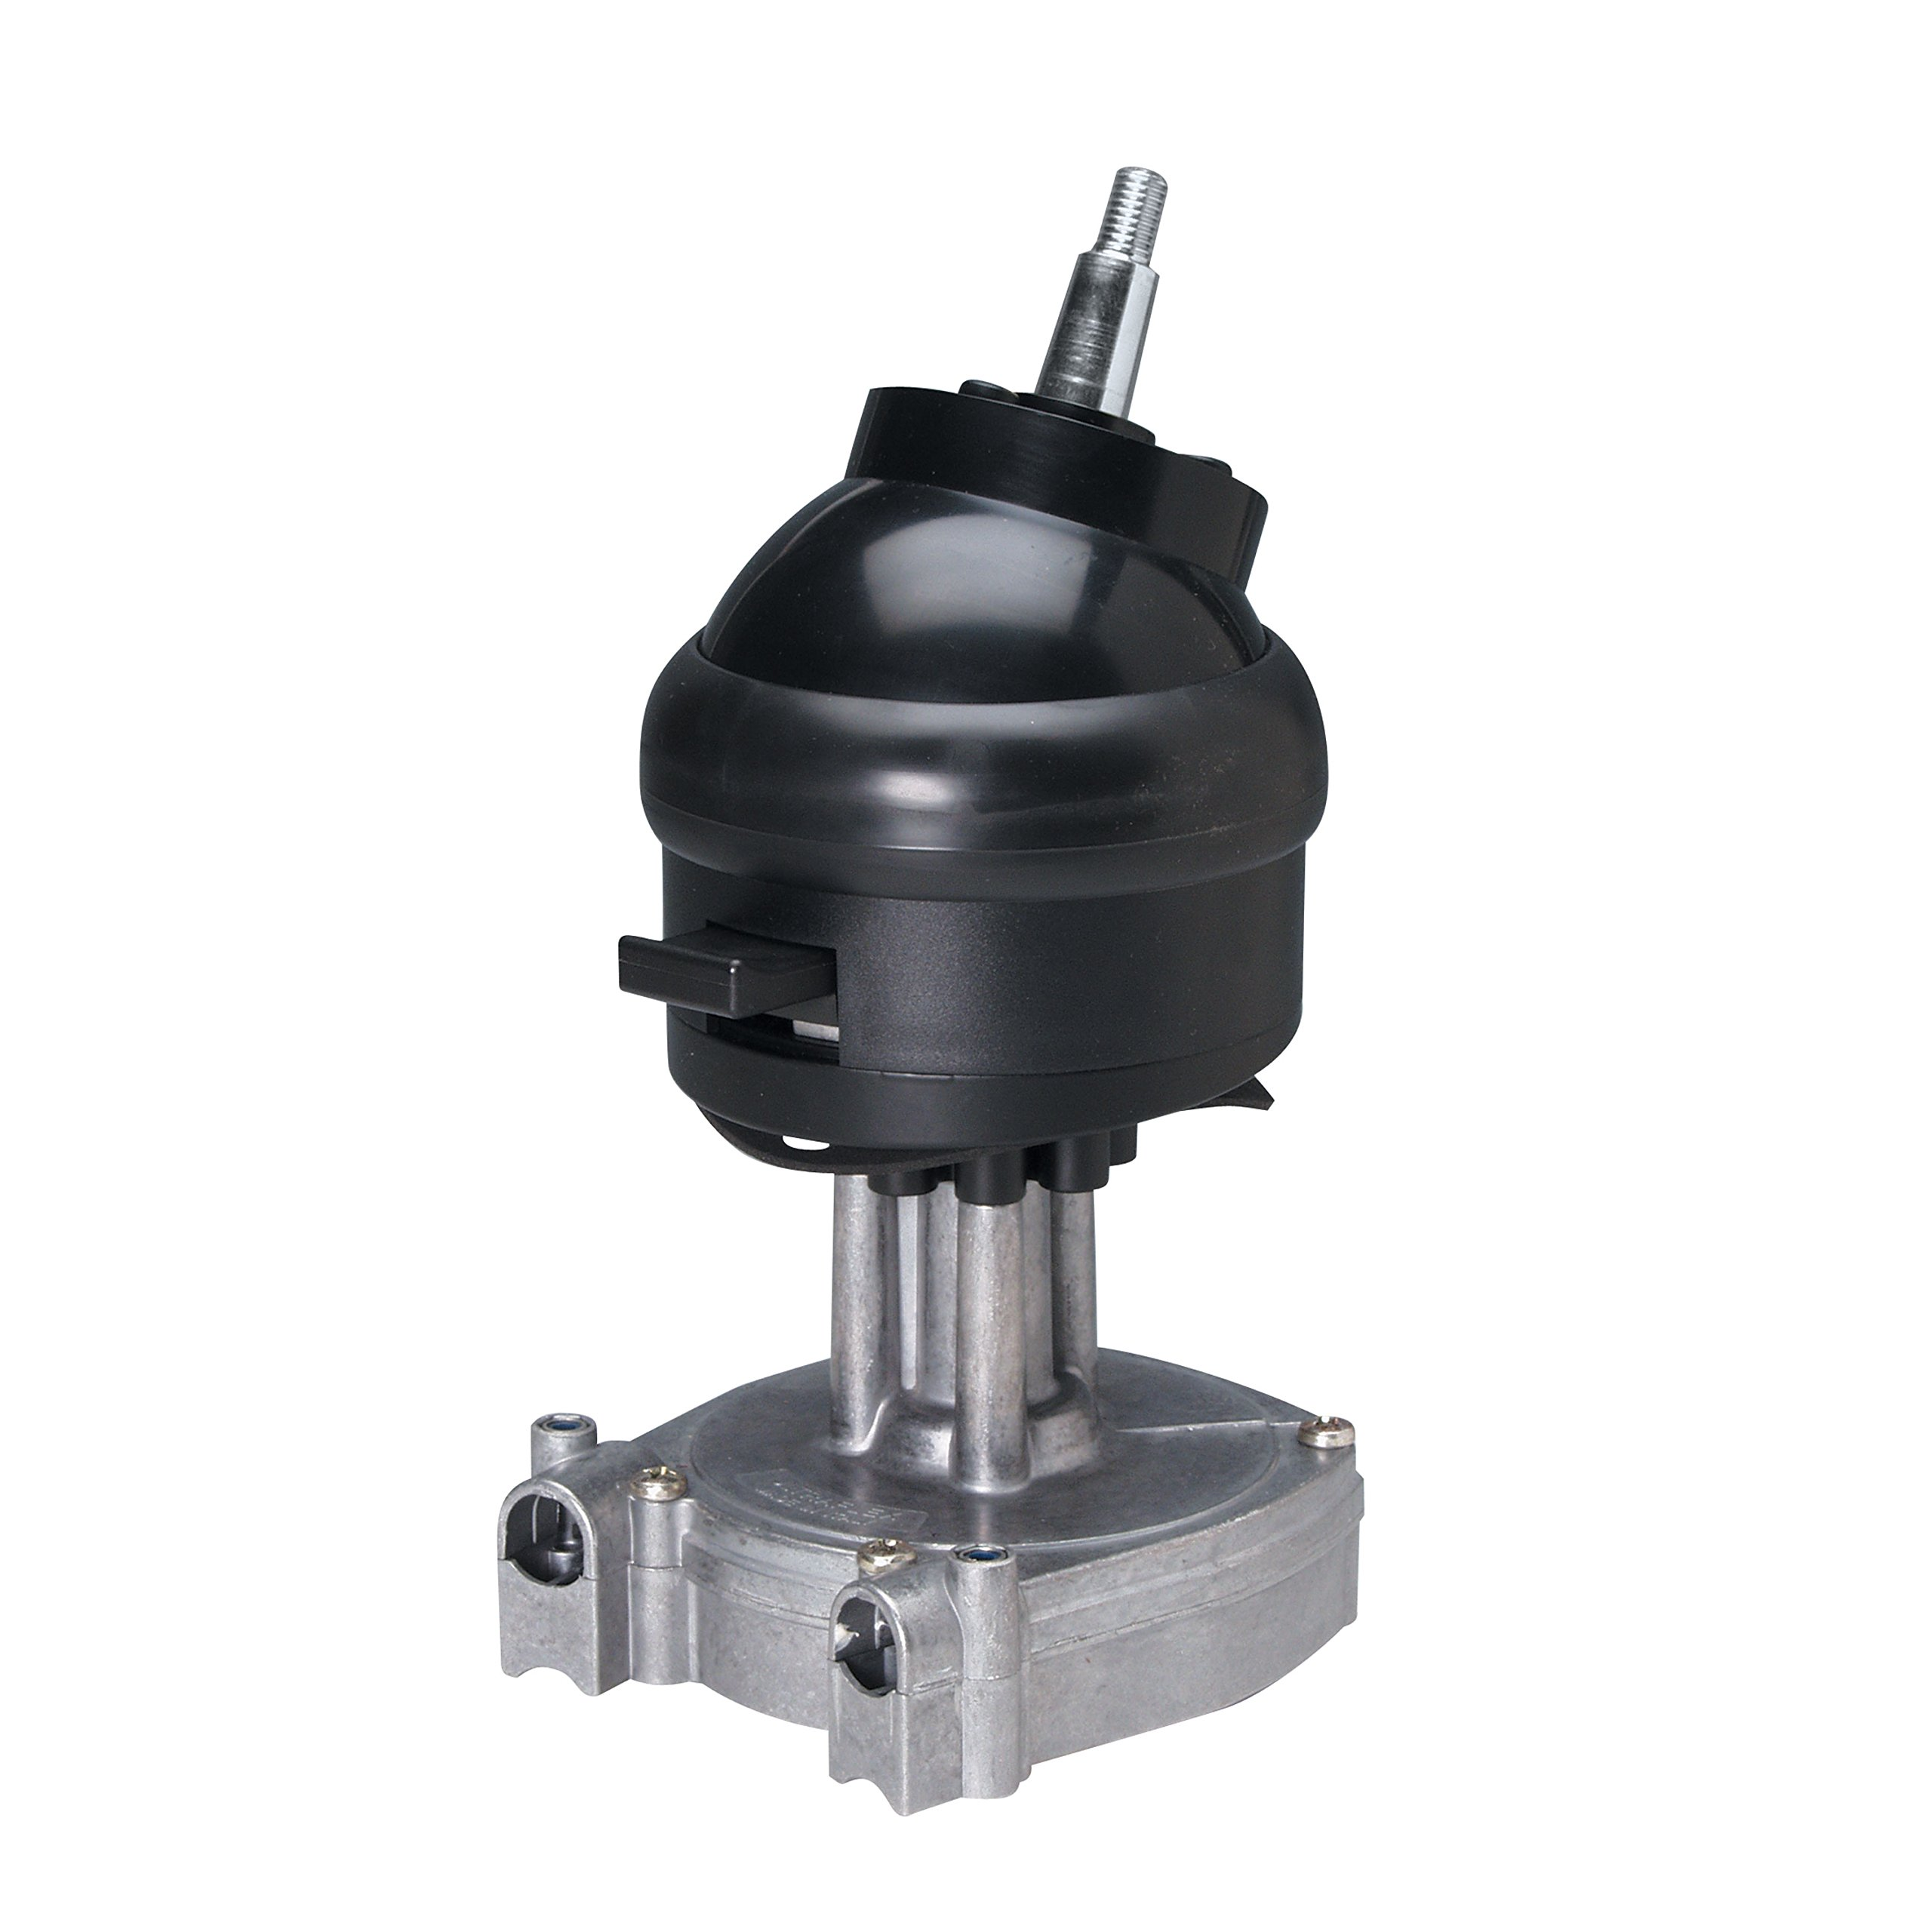 Uflex T81FC Single Cable Rotary Tilt Helm by uflex